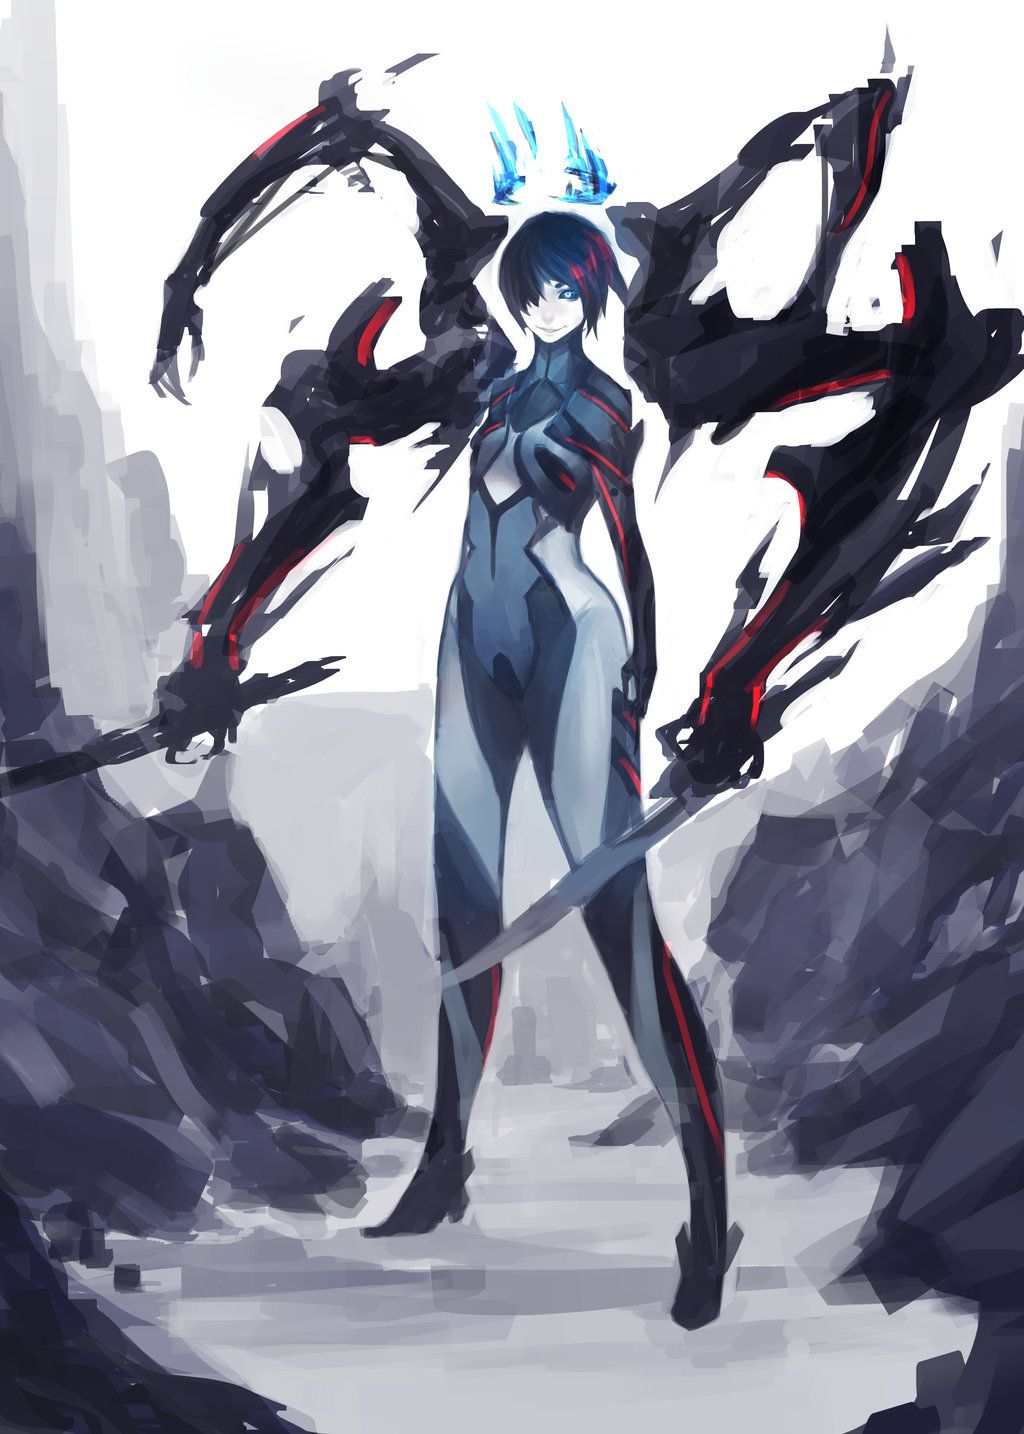 Mecha Girl  Dark fantasy art, Mecha, Concept art characters